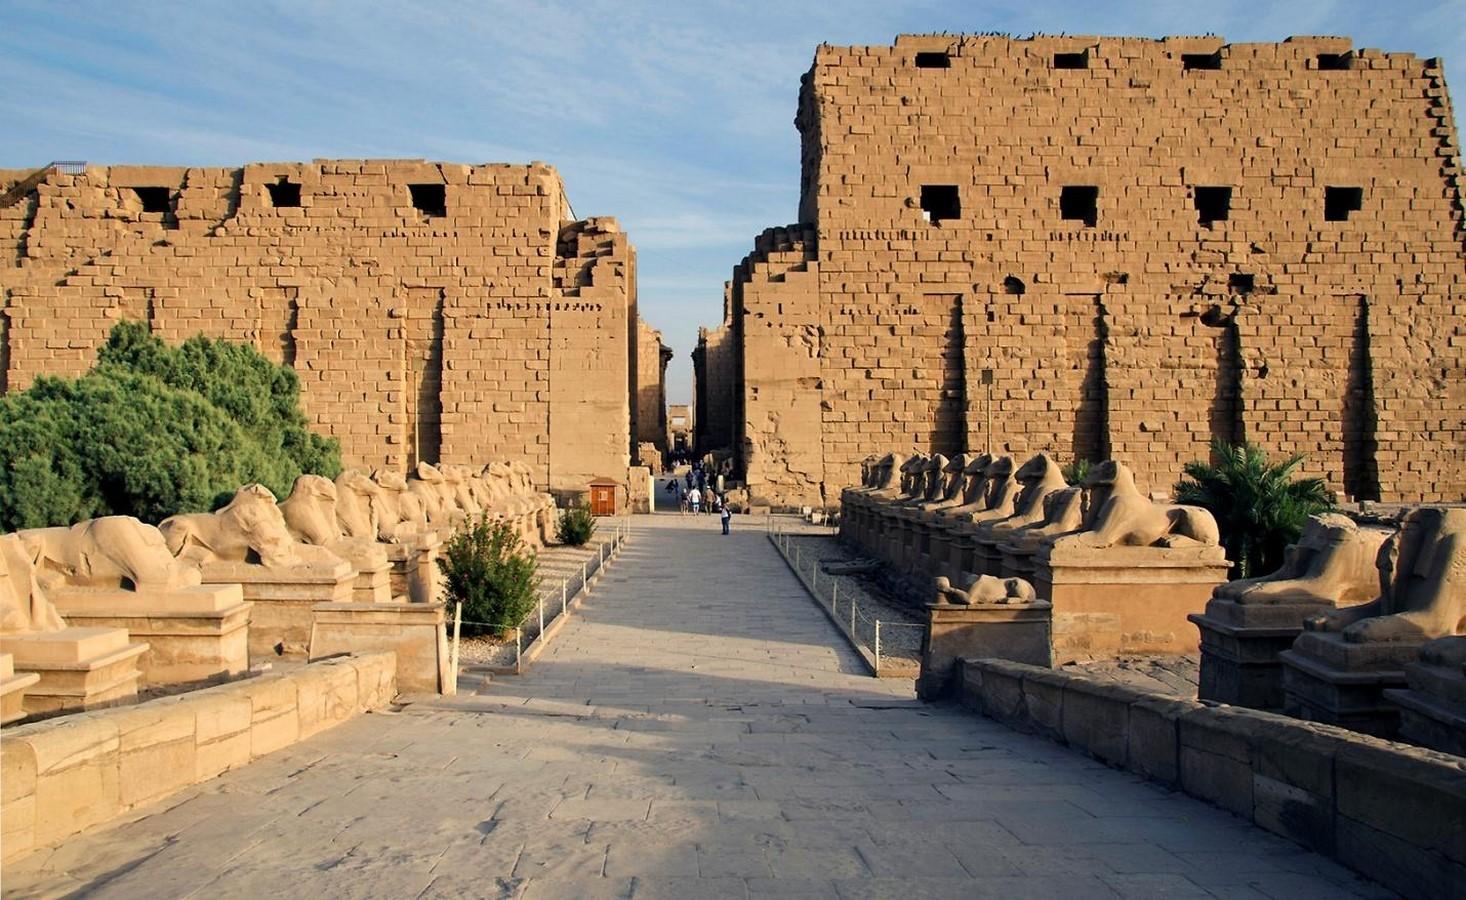 Religion shaped Egyptian Architectural identity - Sheet1